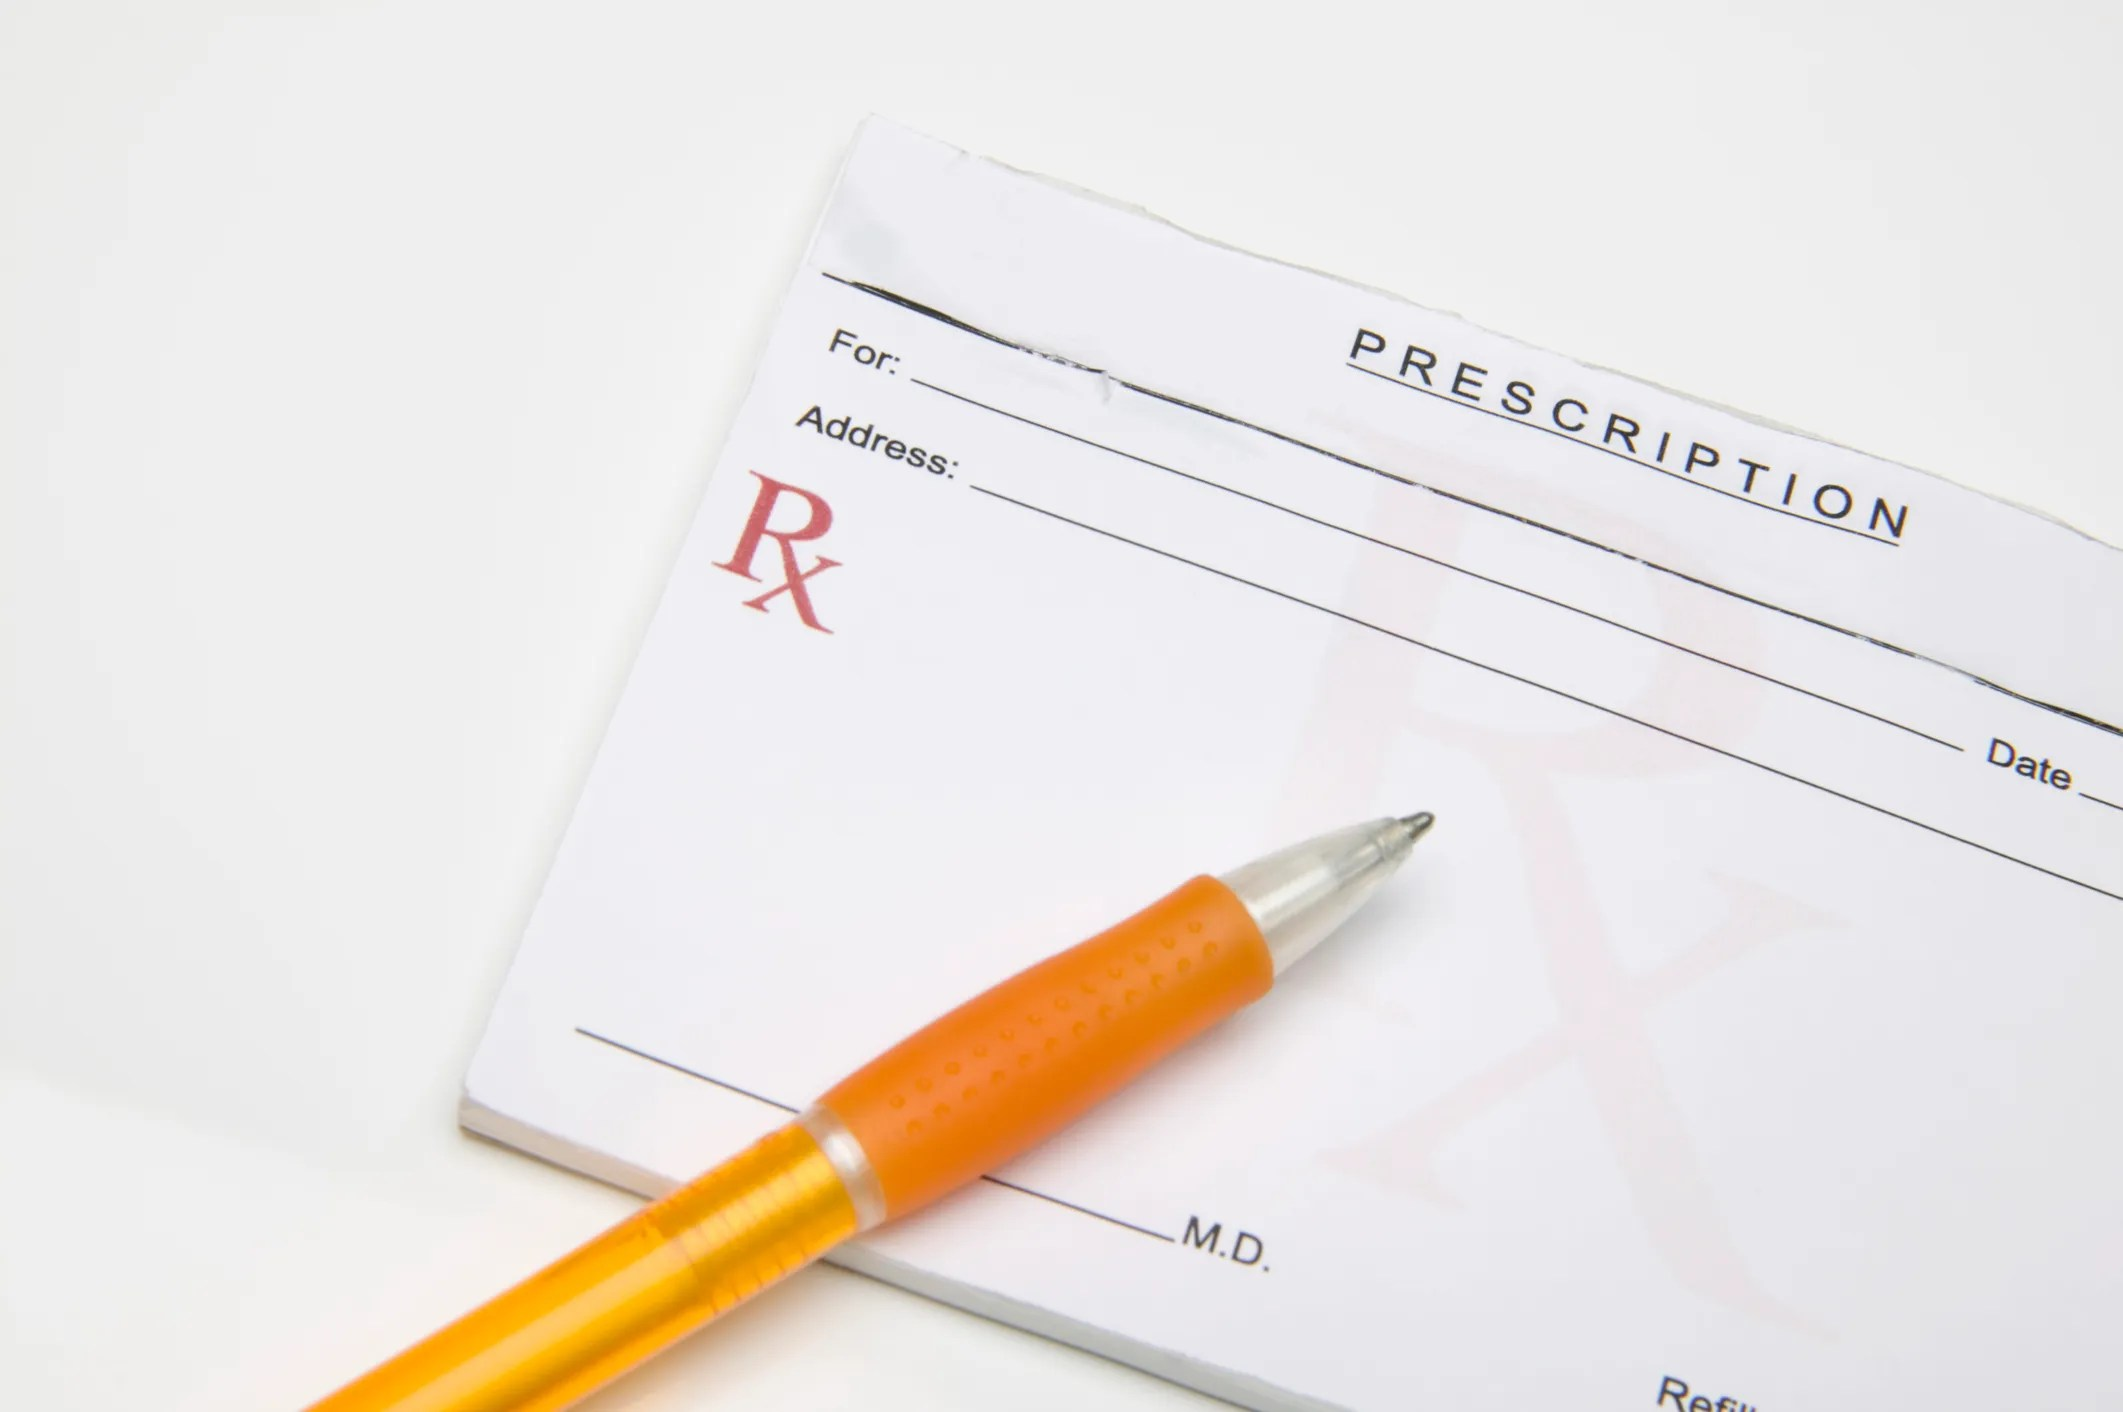 prescription pad for ADHD medication